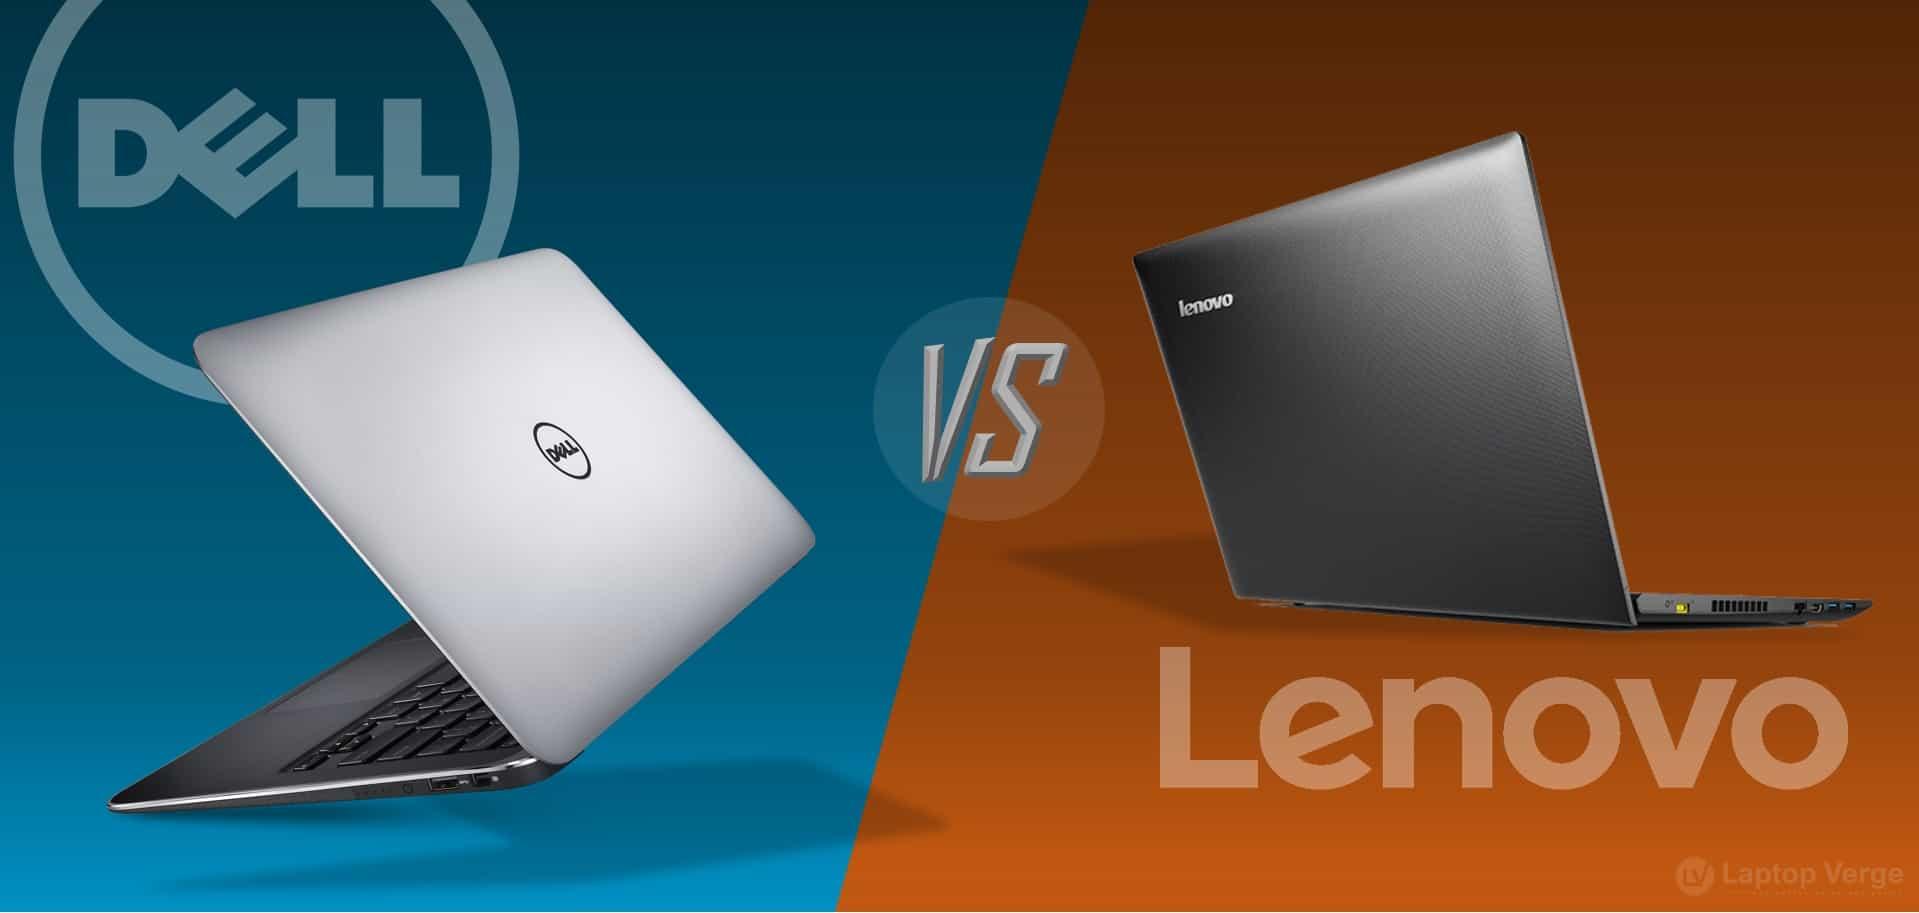 Dell vs Lenovo